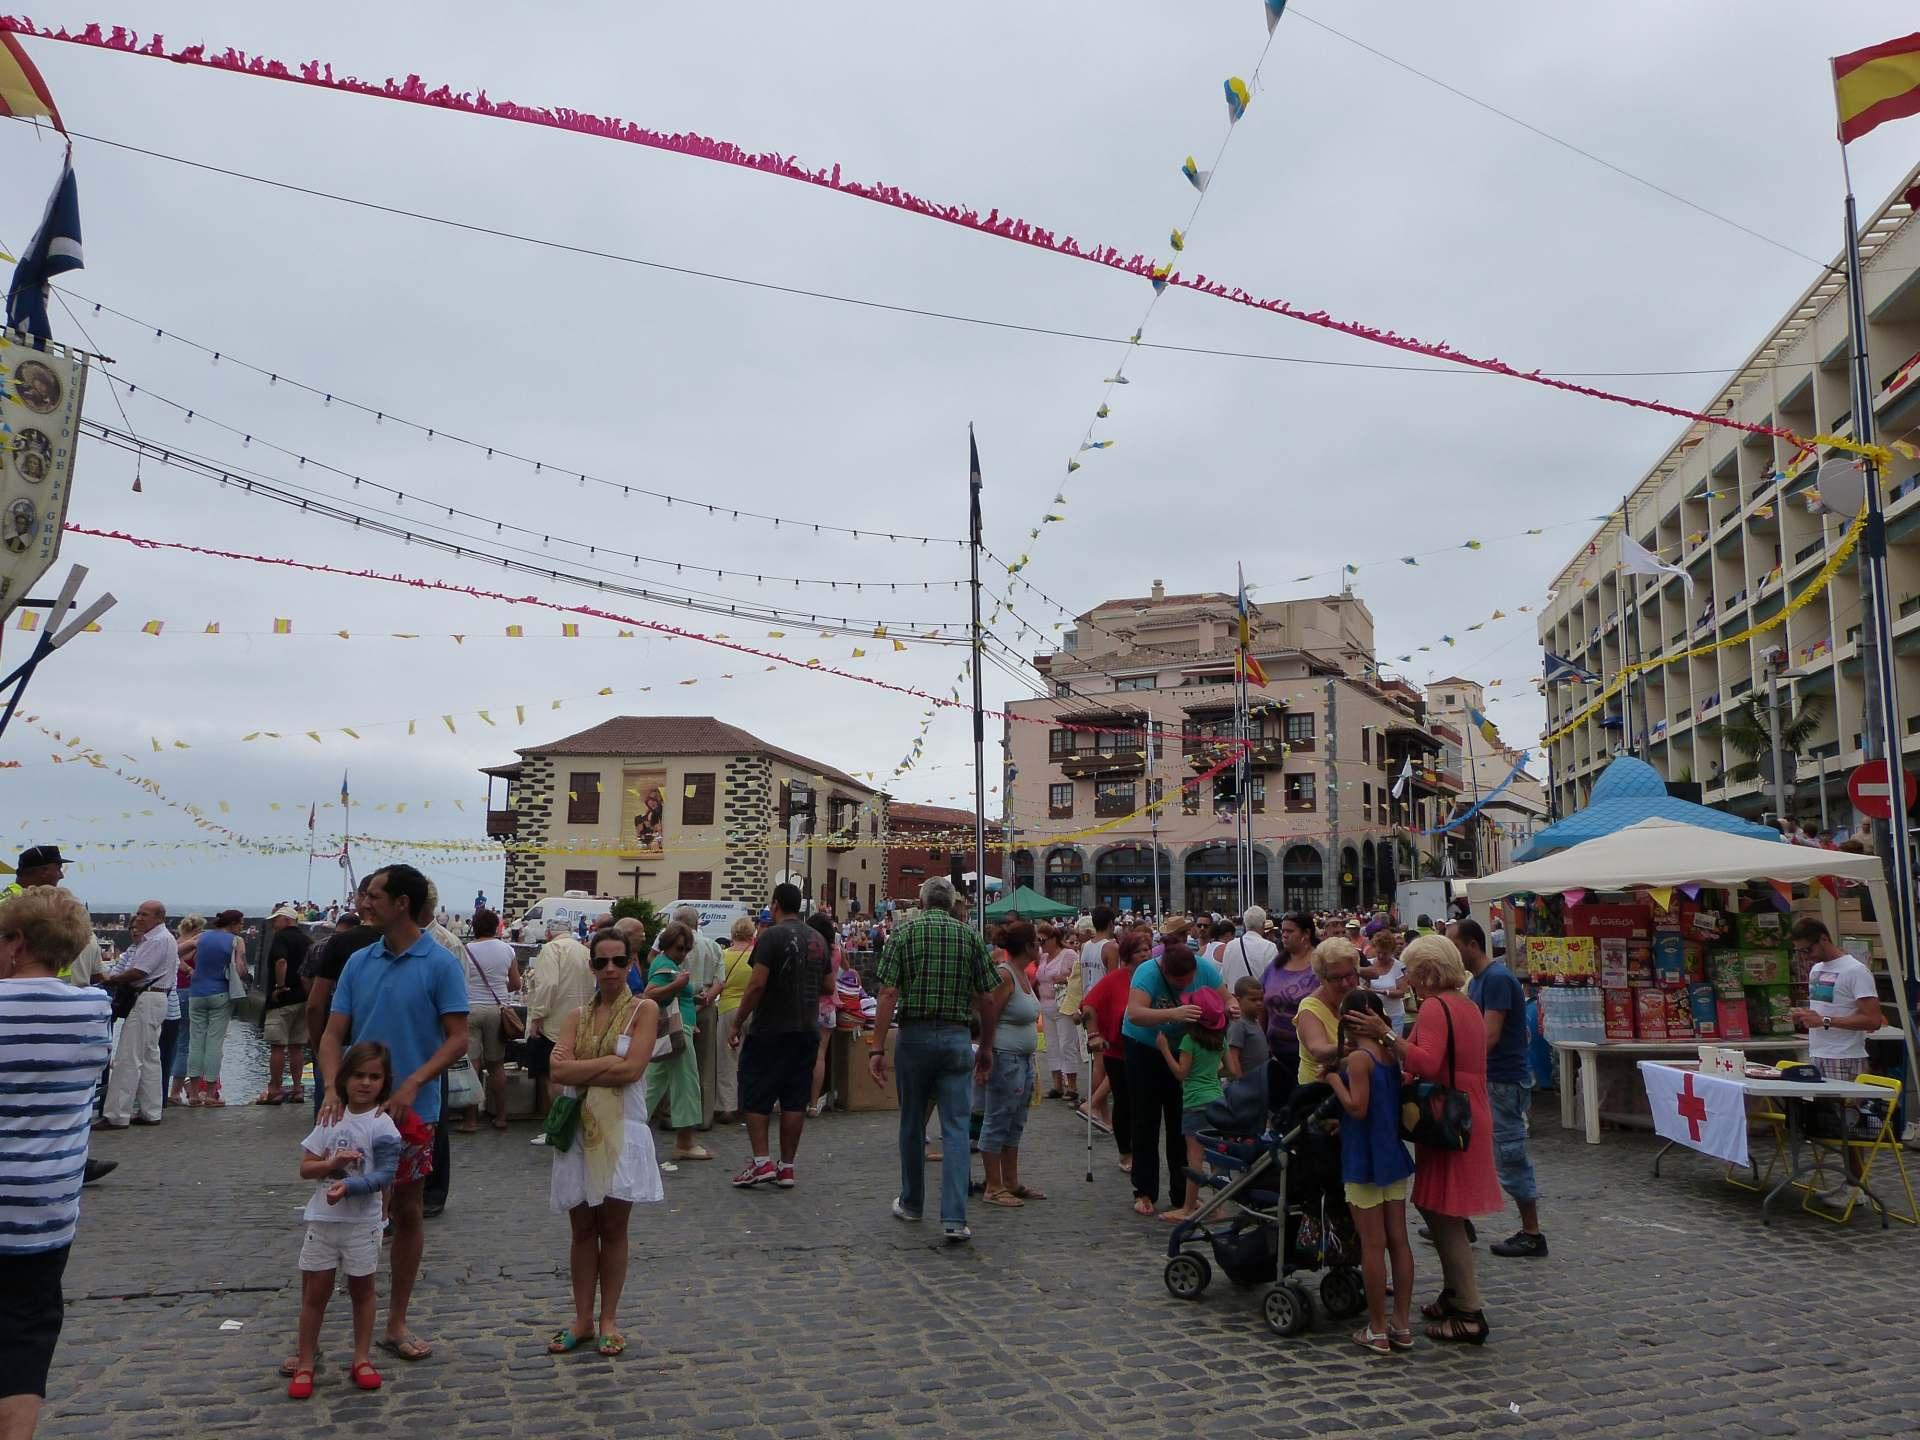 Fiesta de Nuestra Senora del Carmen